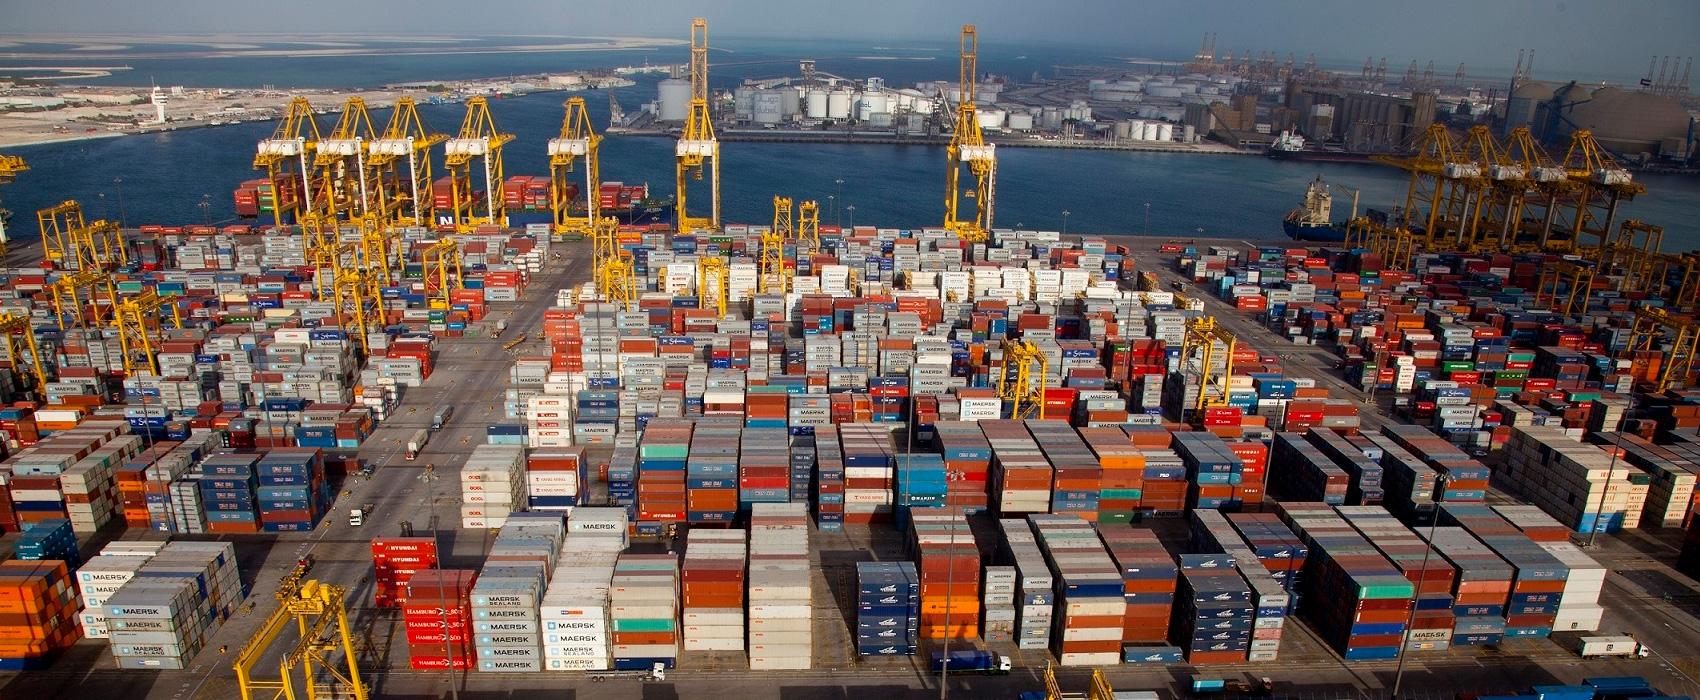 Speedline L L C   Freight Forwarding   Logistics